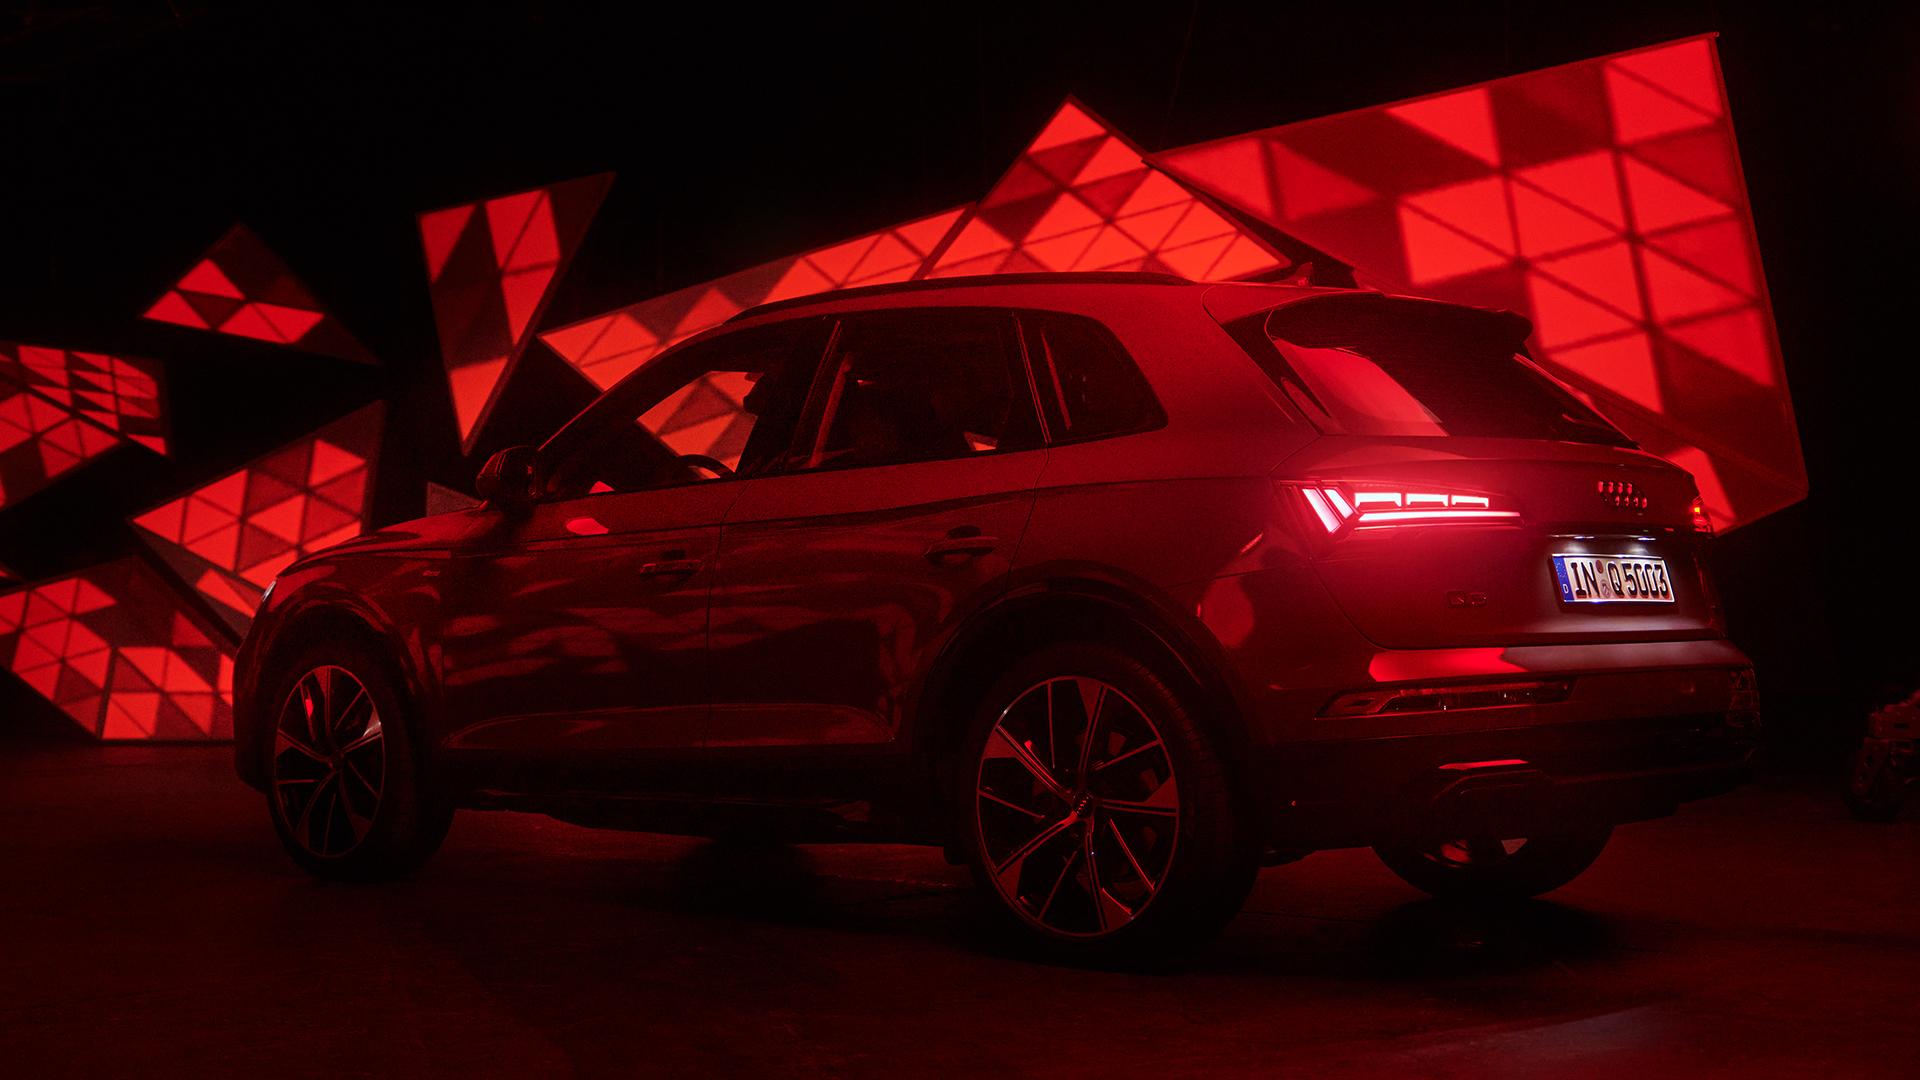 Audi Q5 SUV v abstraktnem svetlobnem okolju.